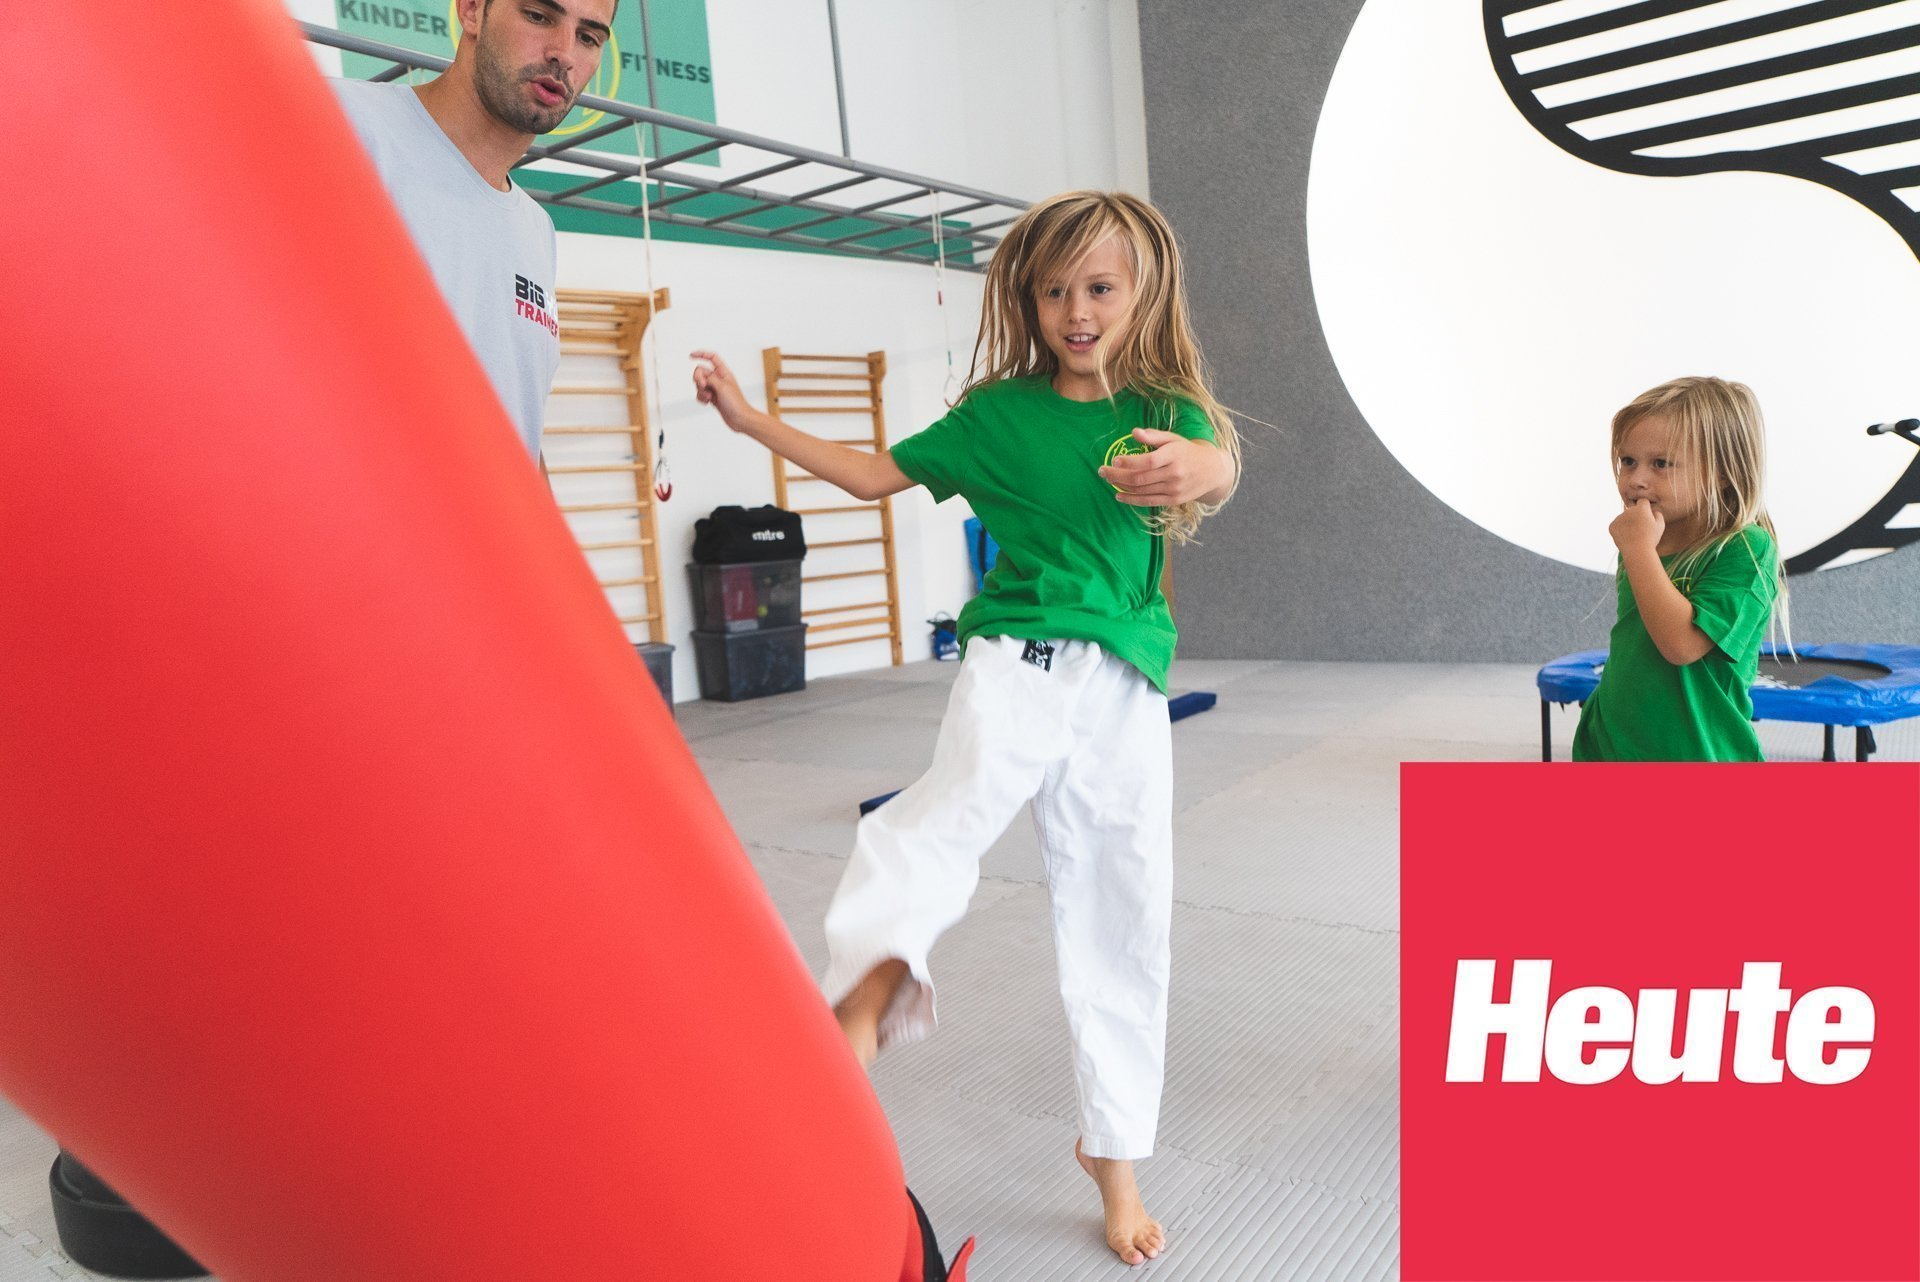 YOUNG-UNG Taekwondo BIG YU Kinderfitness Wagramer Straße